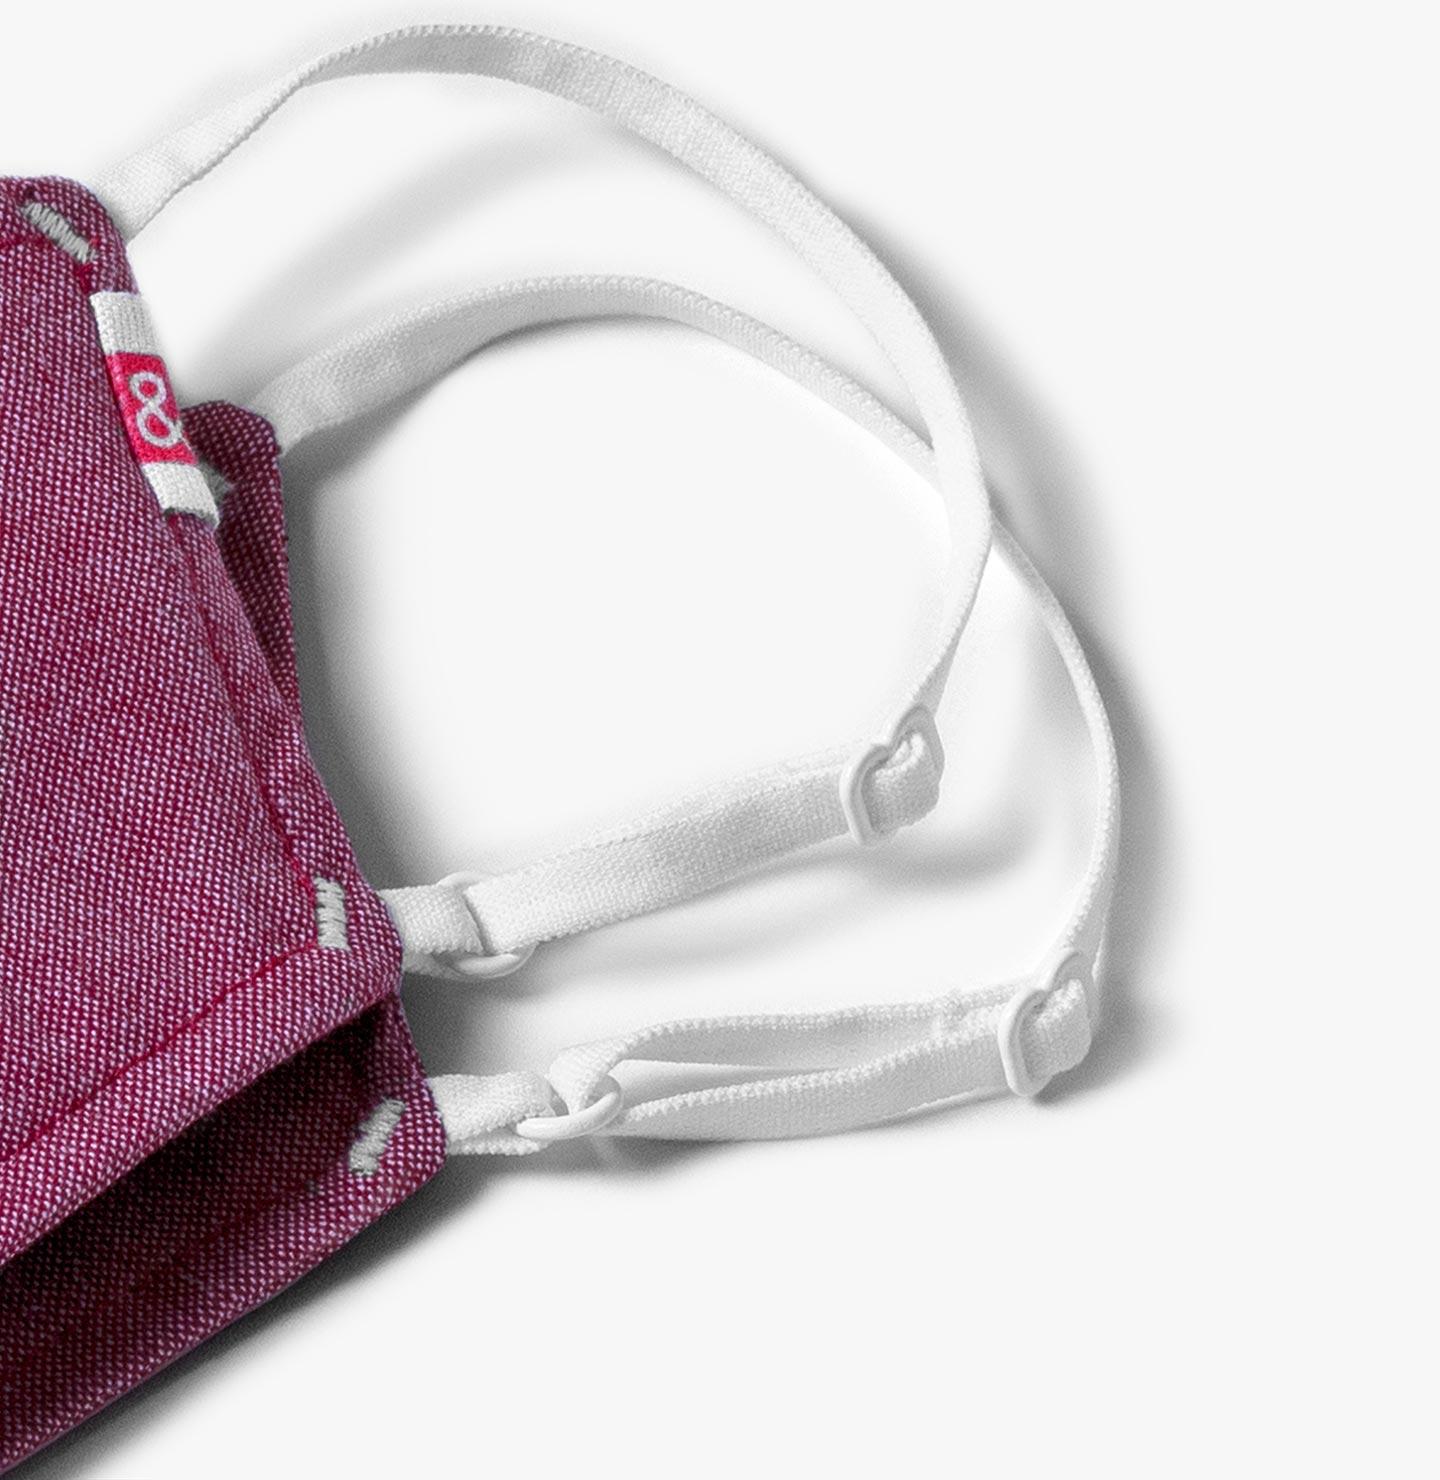 Adjustable Elastic Ear Straps